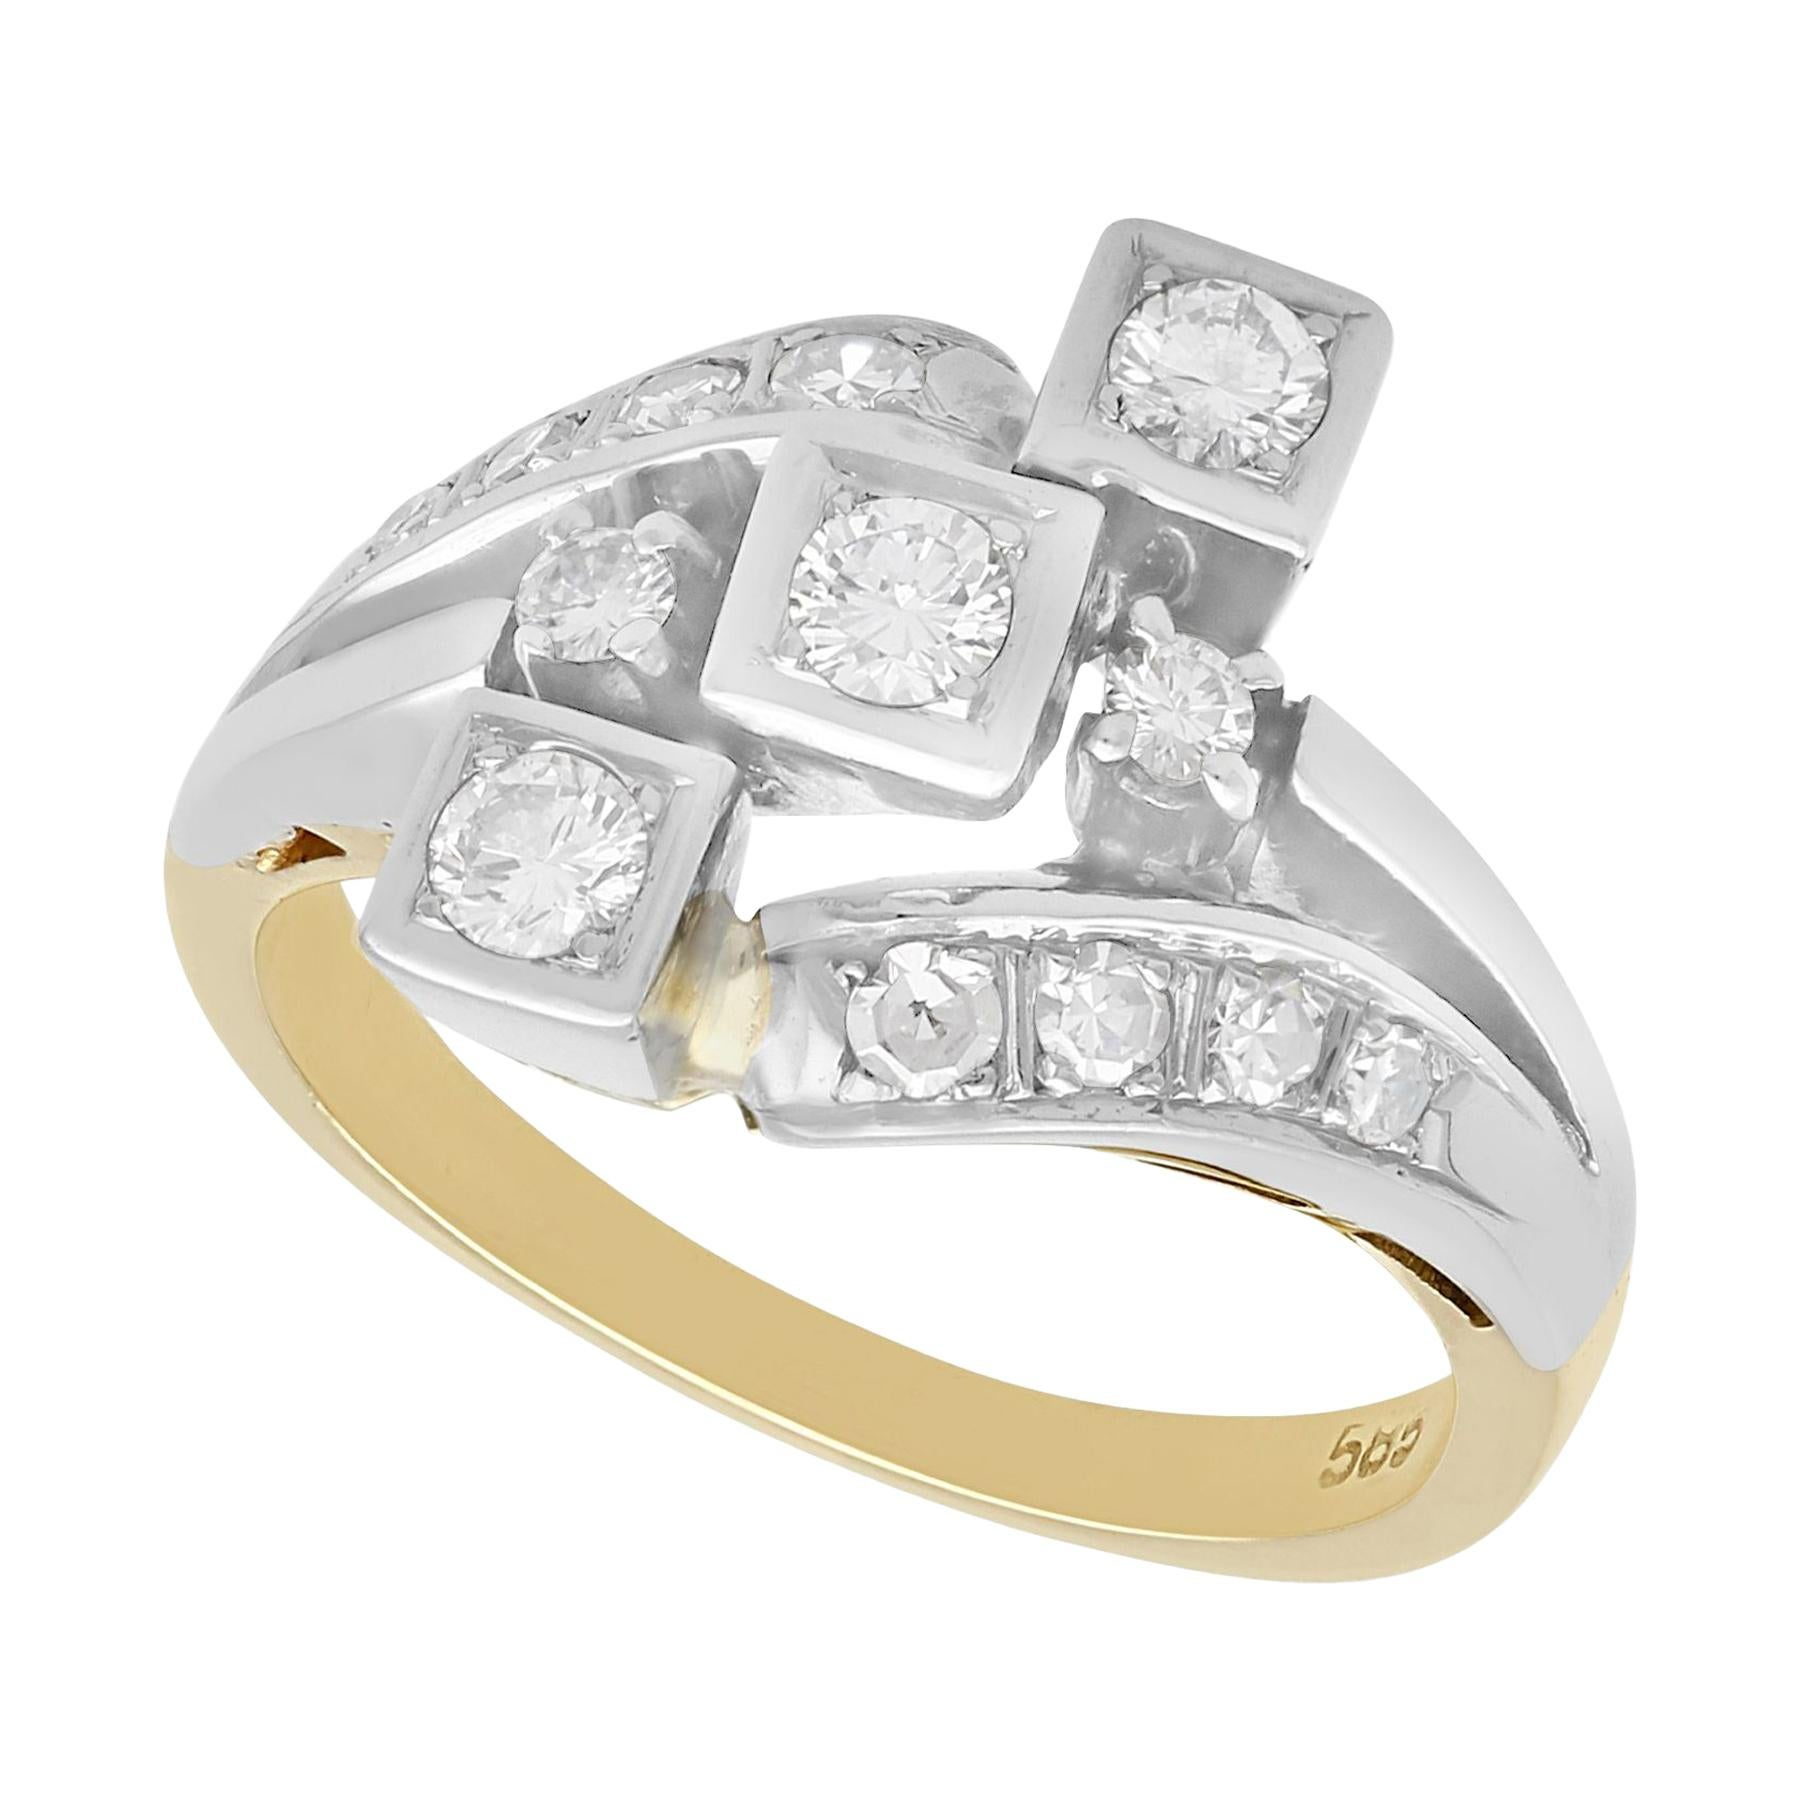 1960s Diamond and Yellow Gold Dress Ring